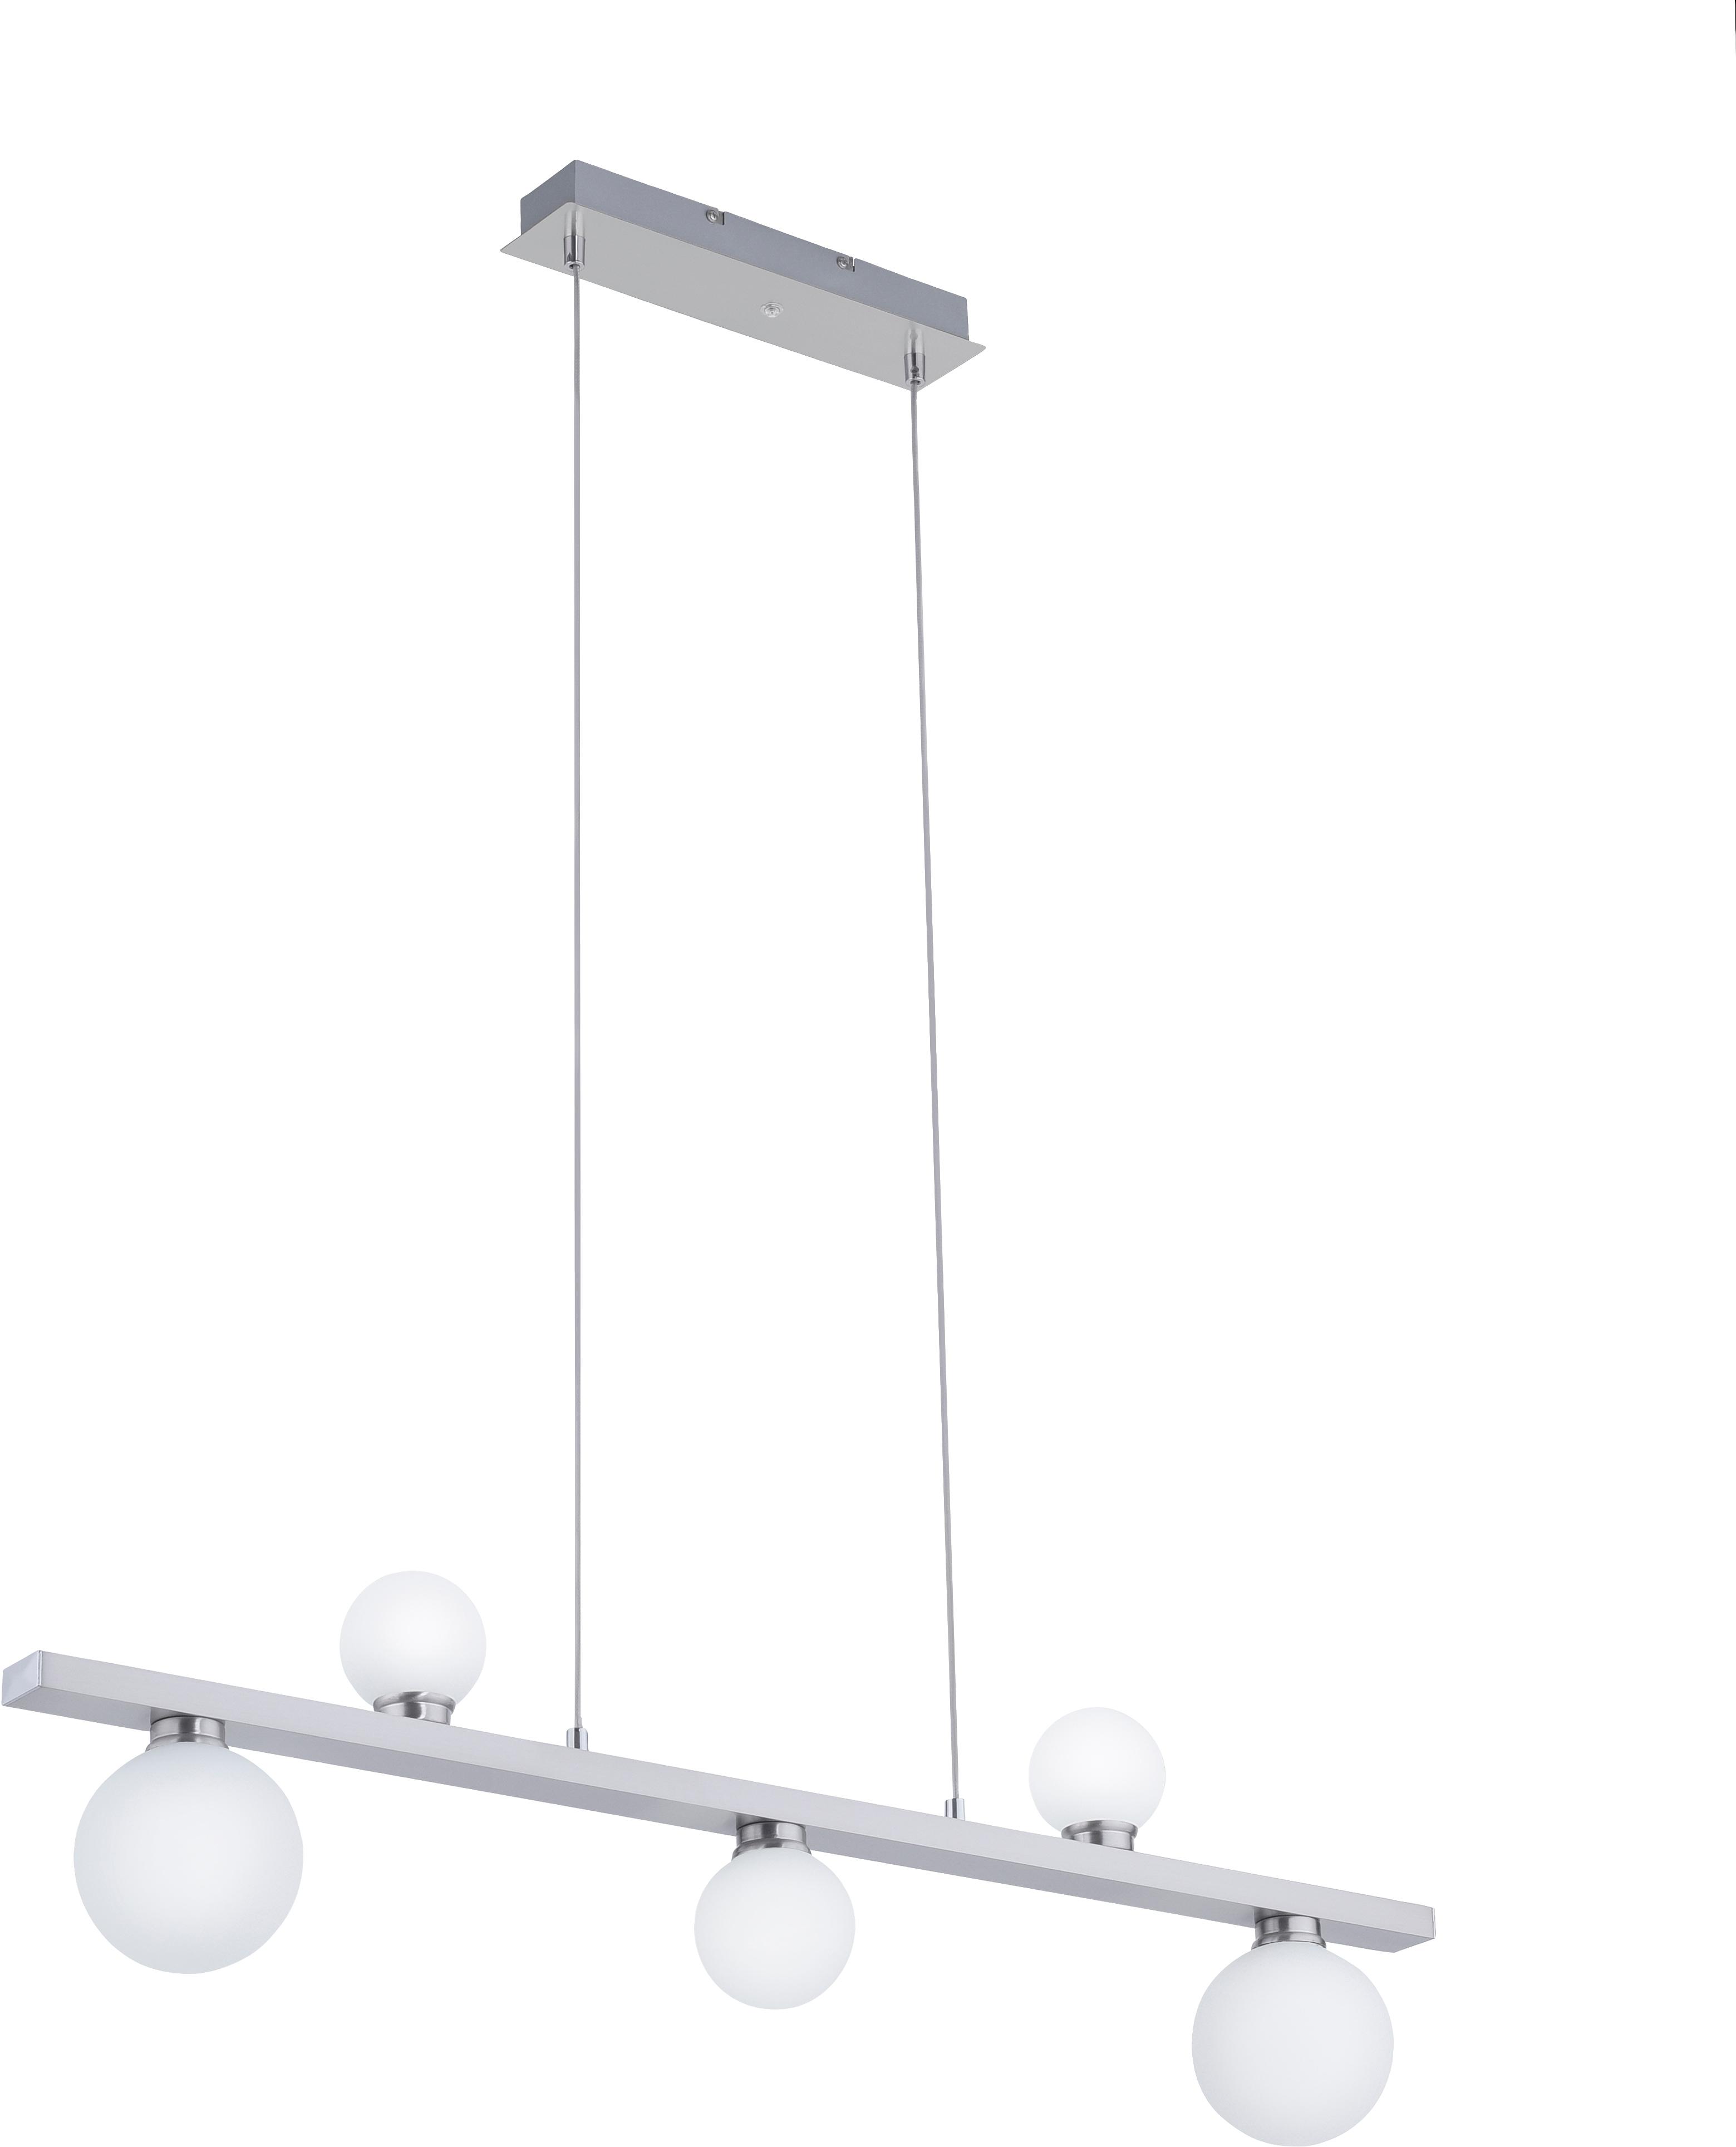 TRIO Leuchten LED Pendelleuchte DICAPO, LED-Board, 1 St., Farbwechsler, Hängeleuchte, RGBW, dimmbar, Smart Home, Farbwechsel